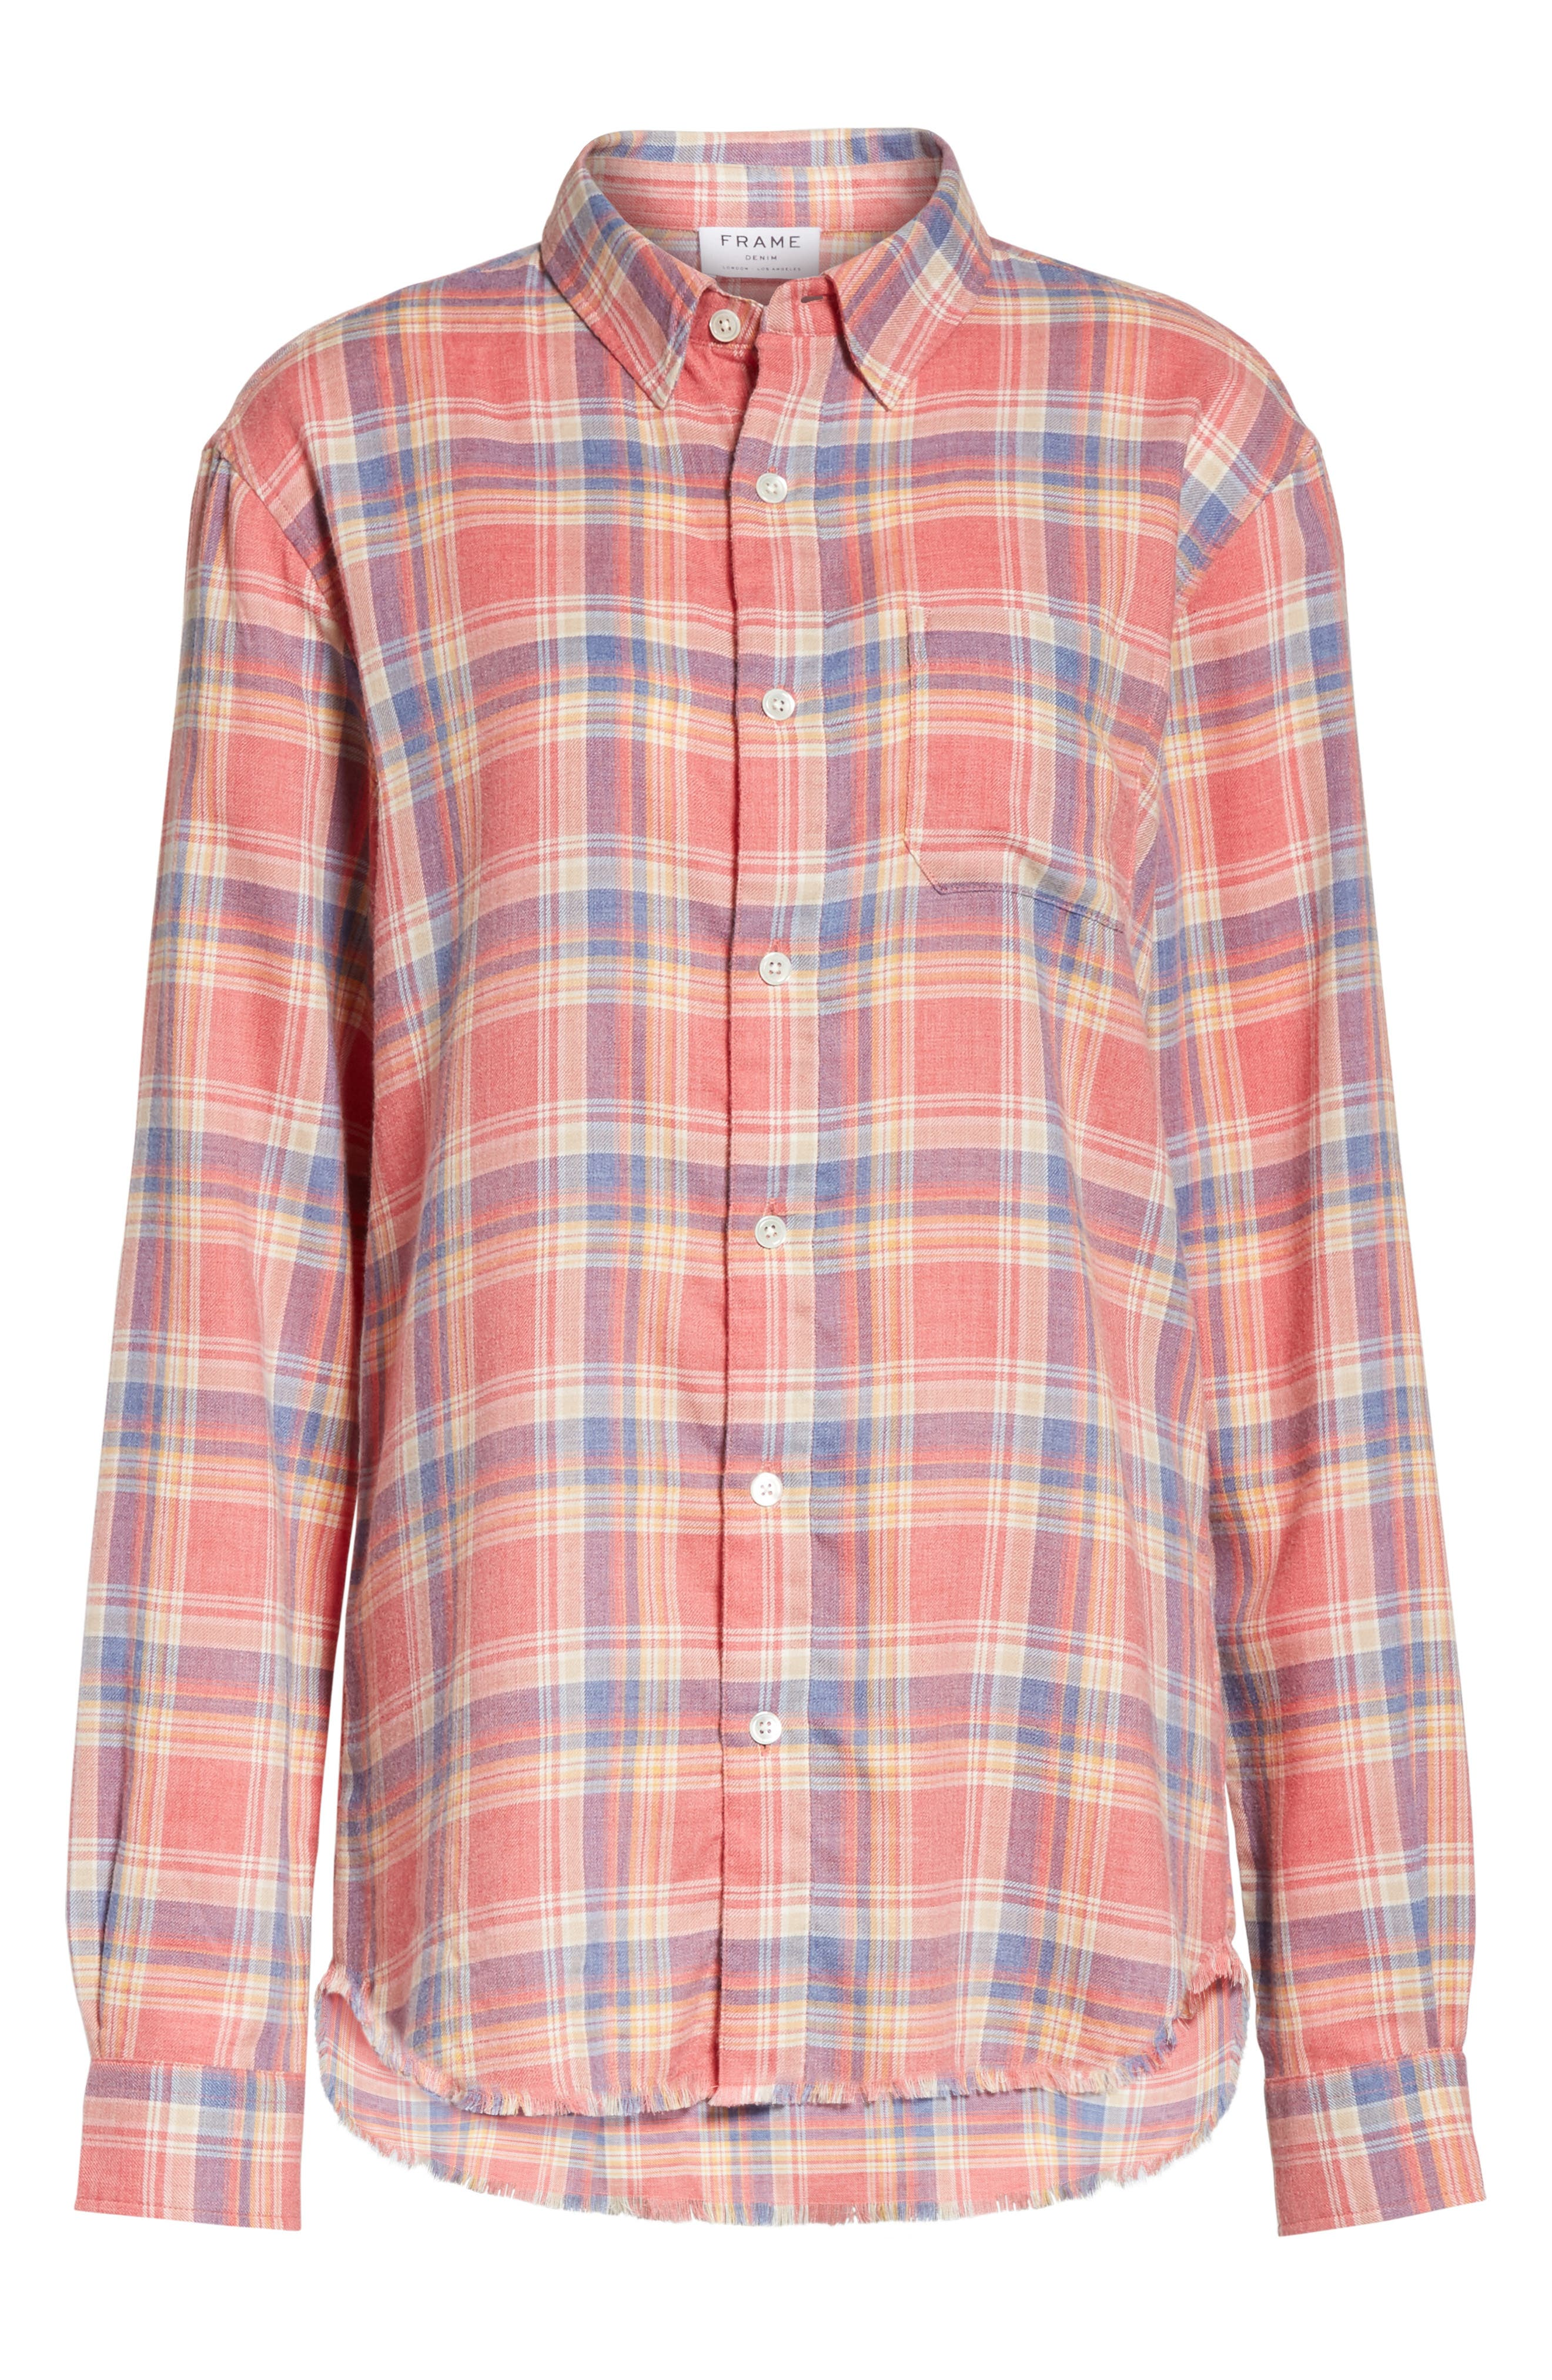 True Plaid Shirt,                             Alternate thumbnail 6, color,                             601